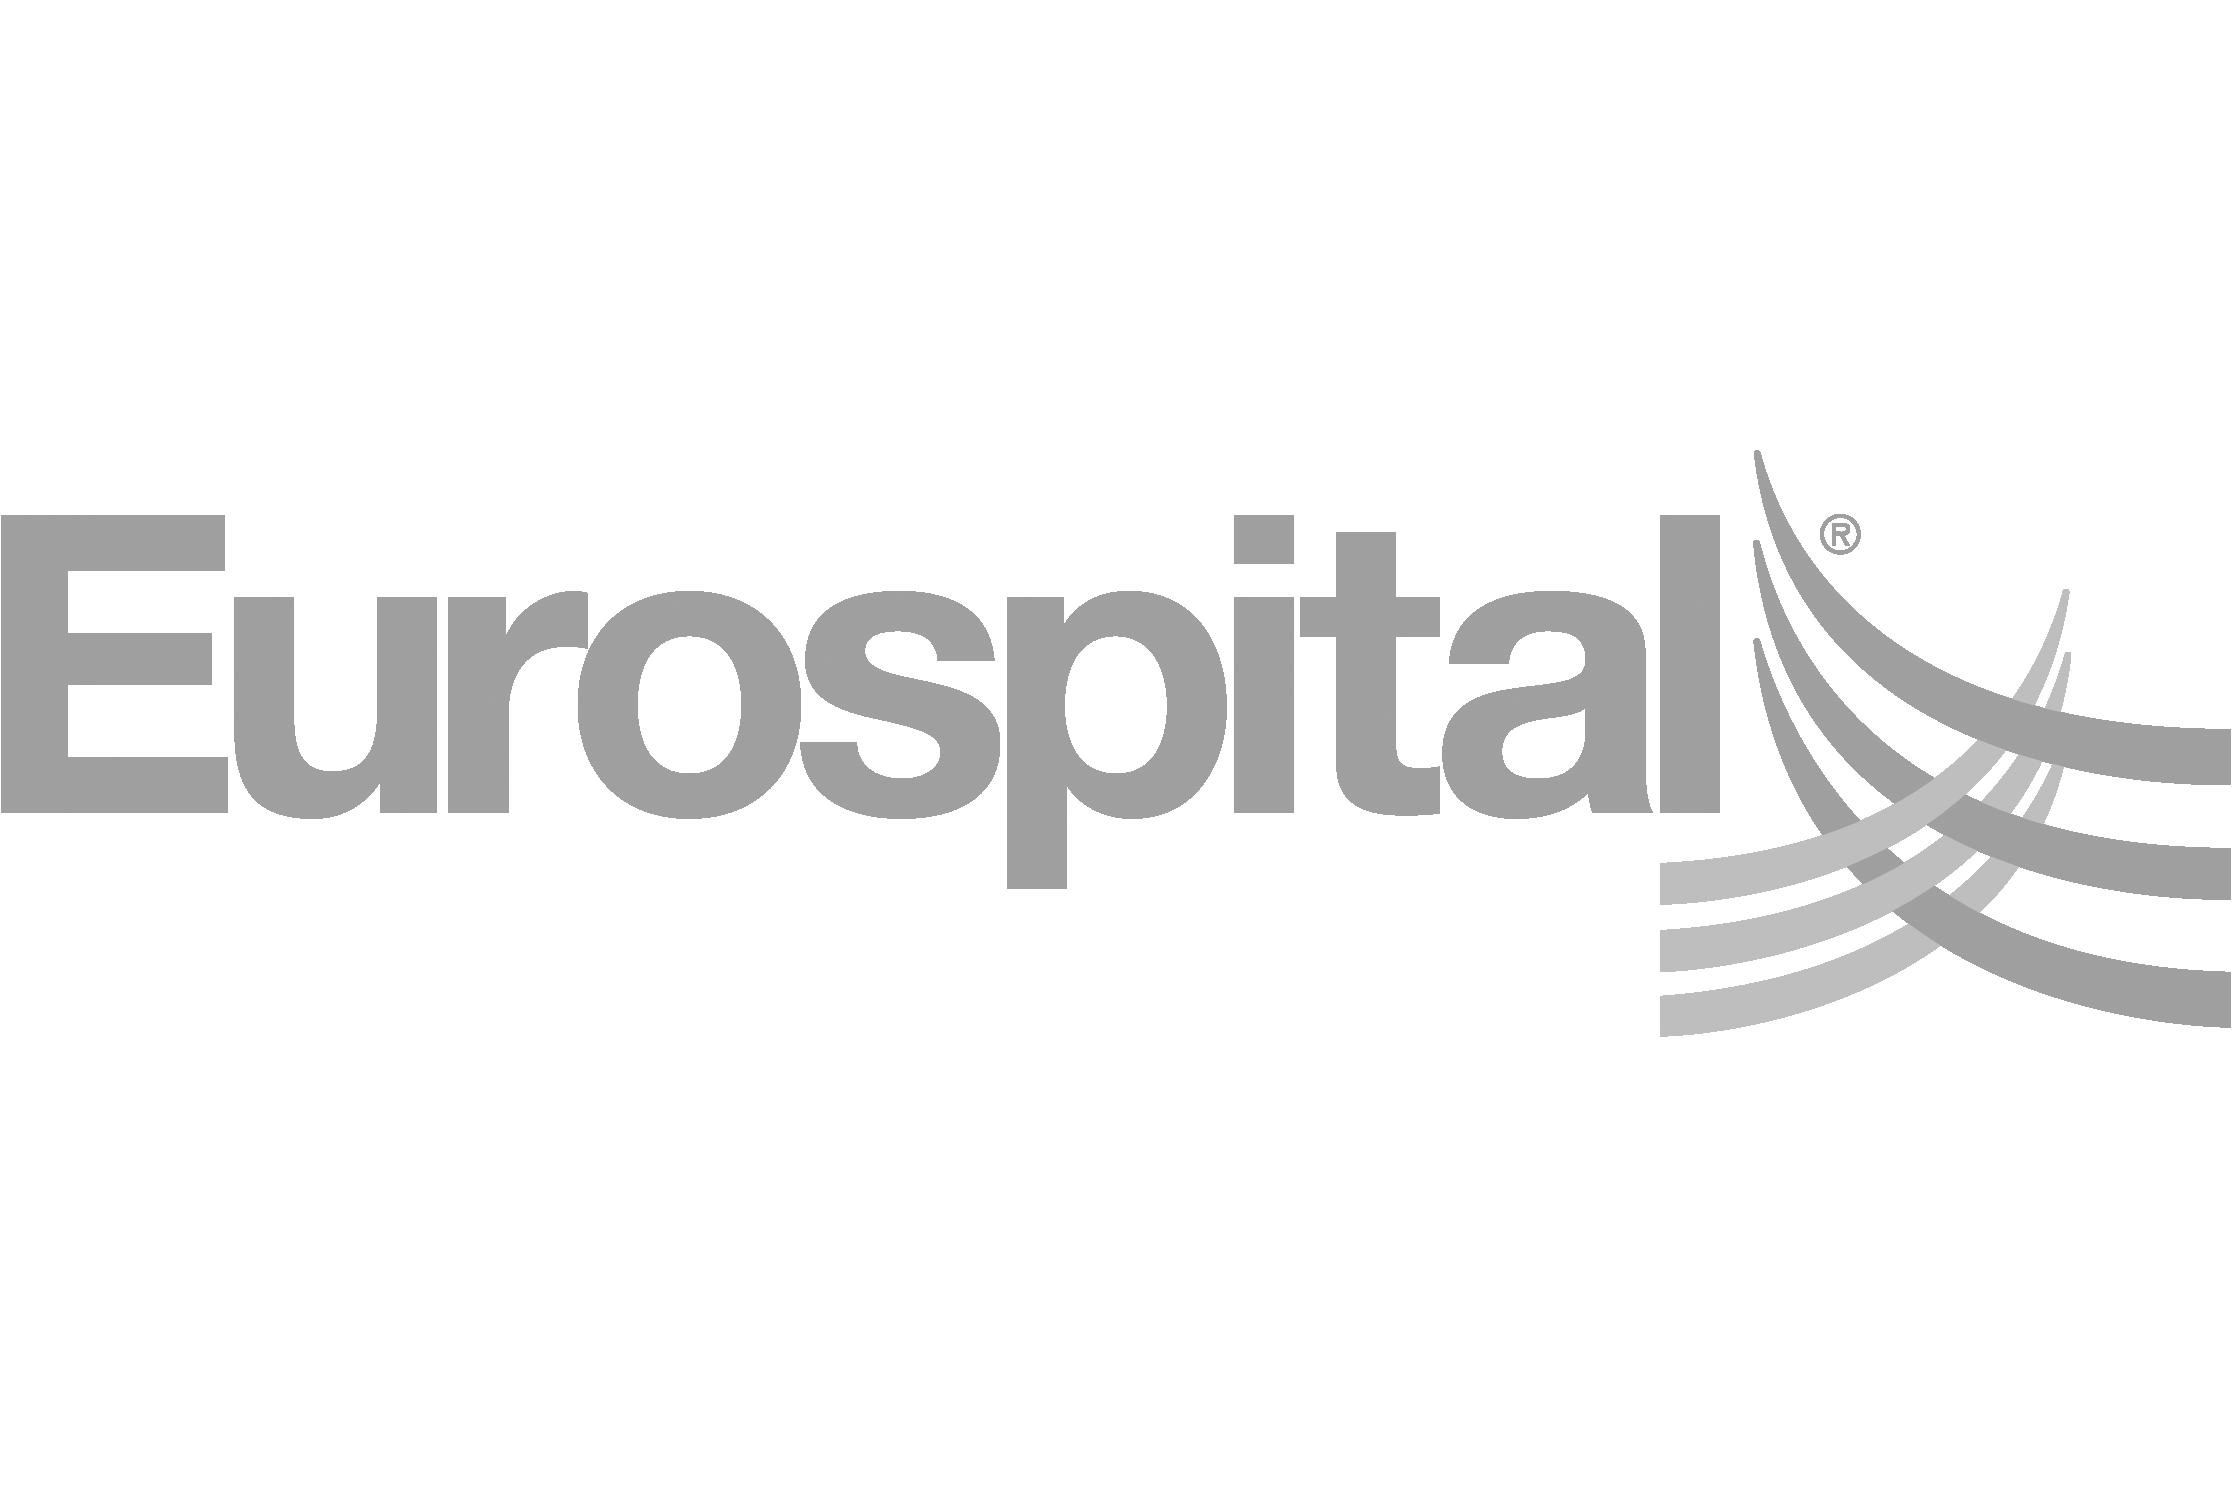 eurospital